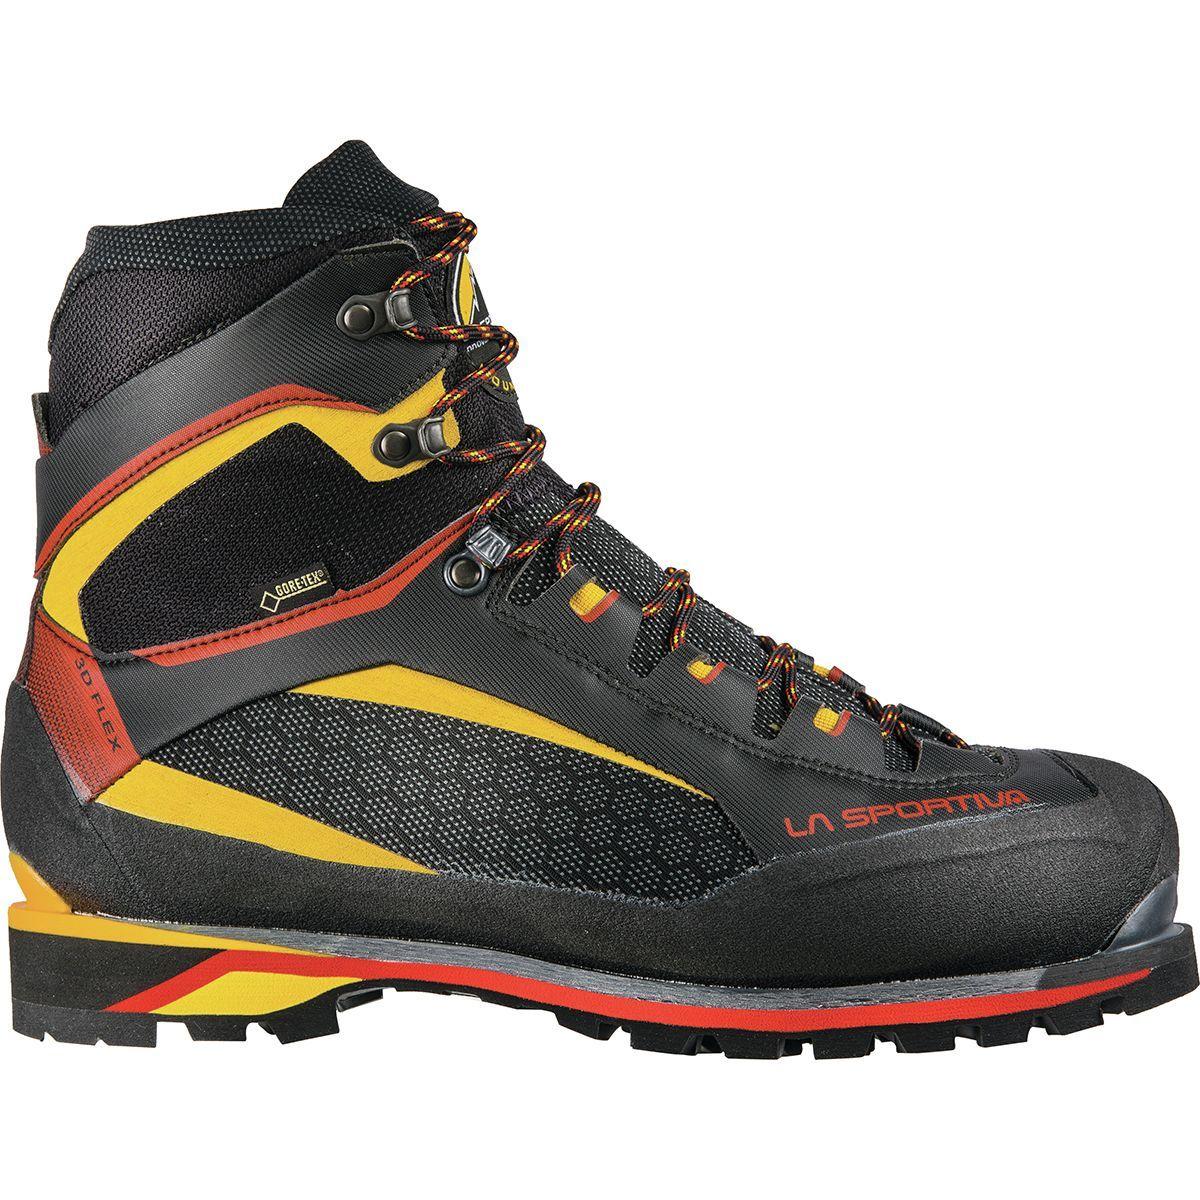 Photo of Trango Tower Extreme GTX Mountaineering Boot – Men's